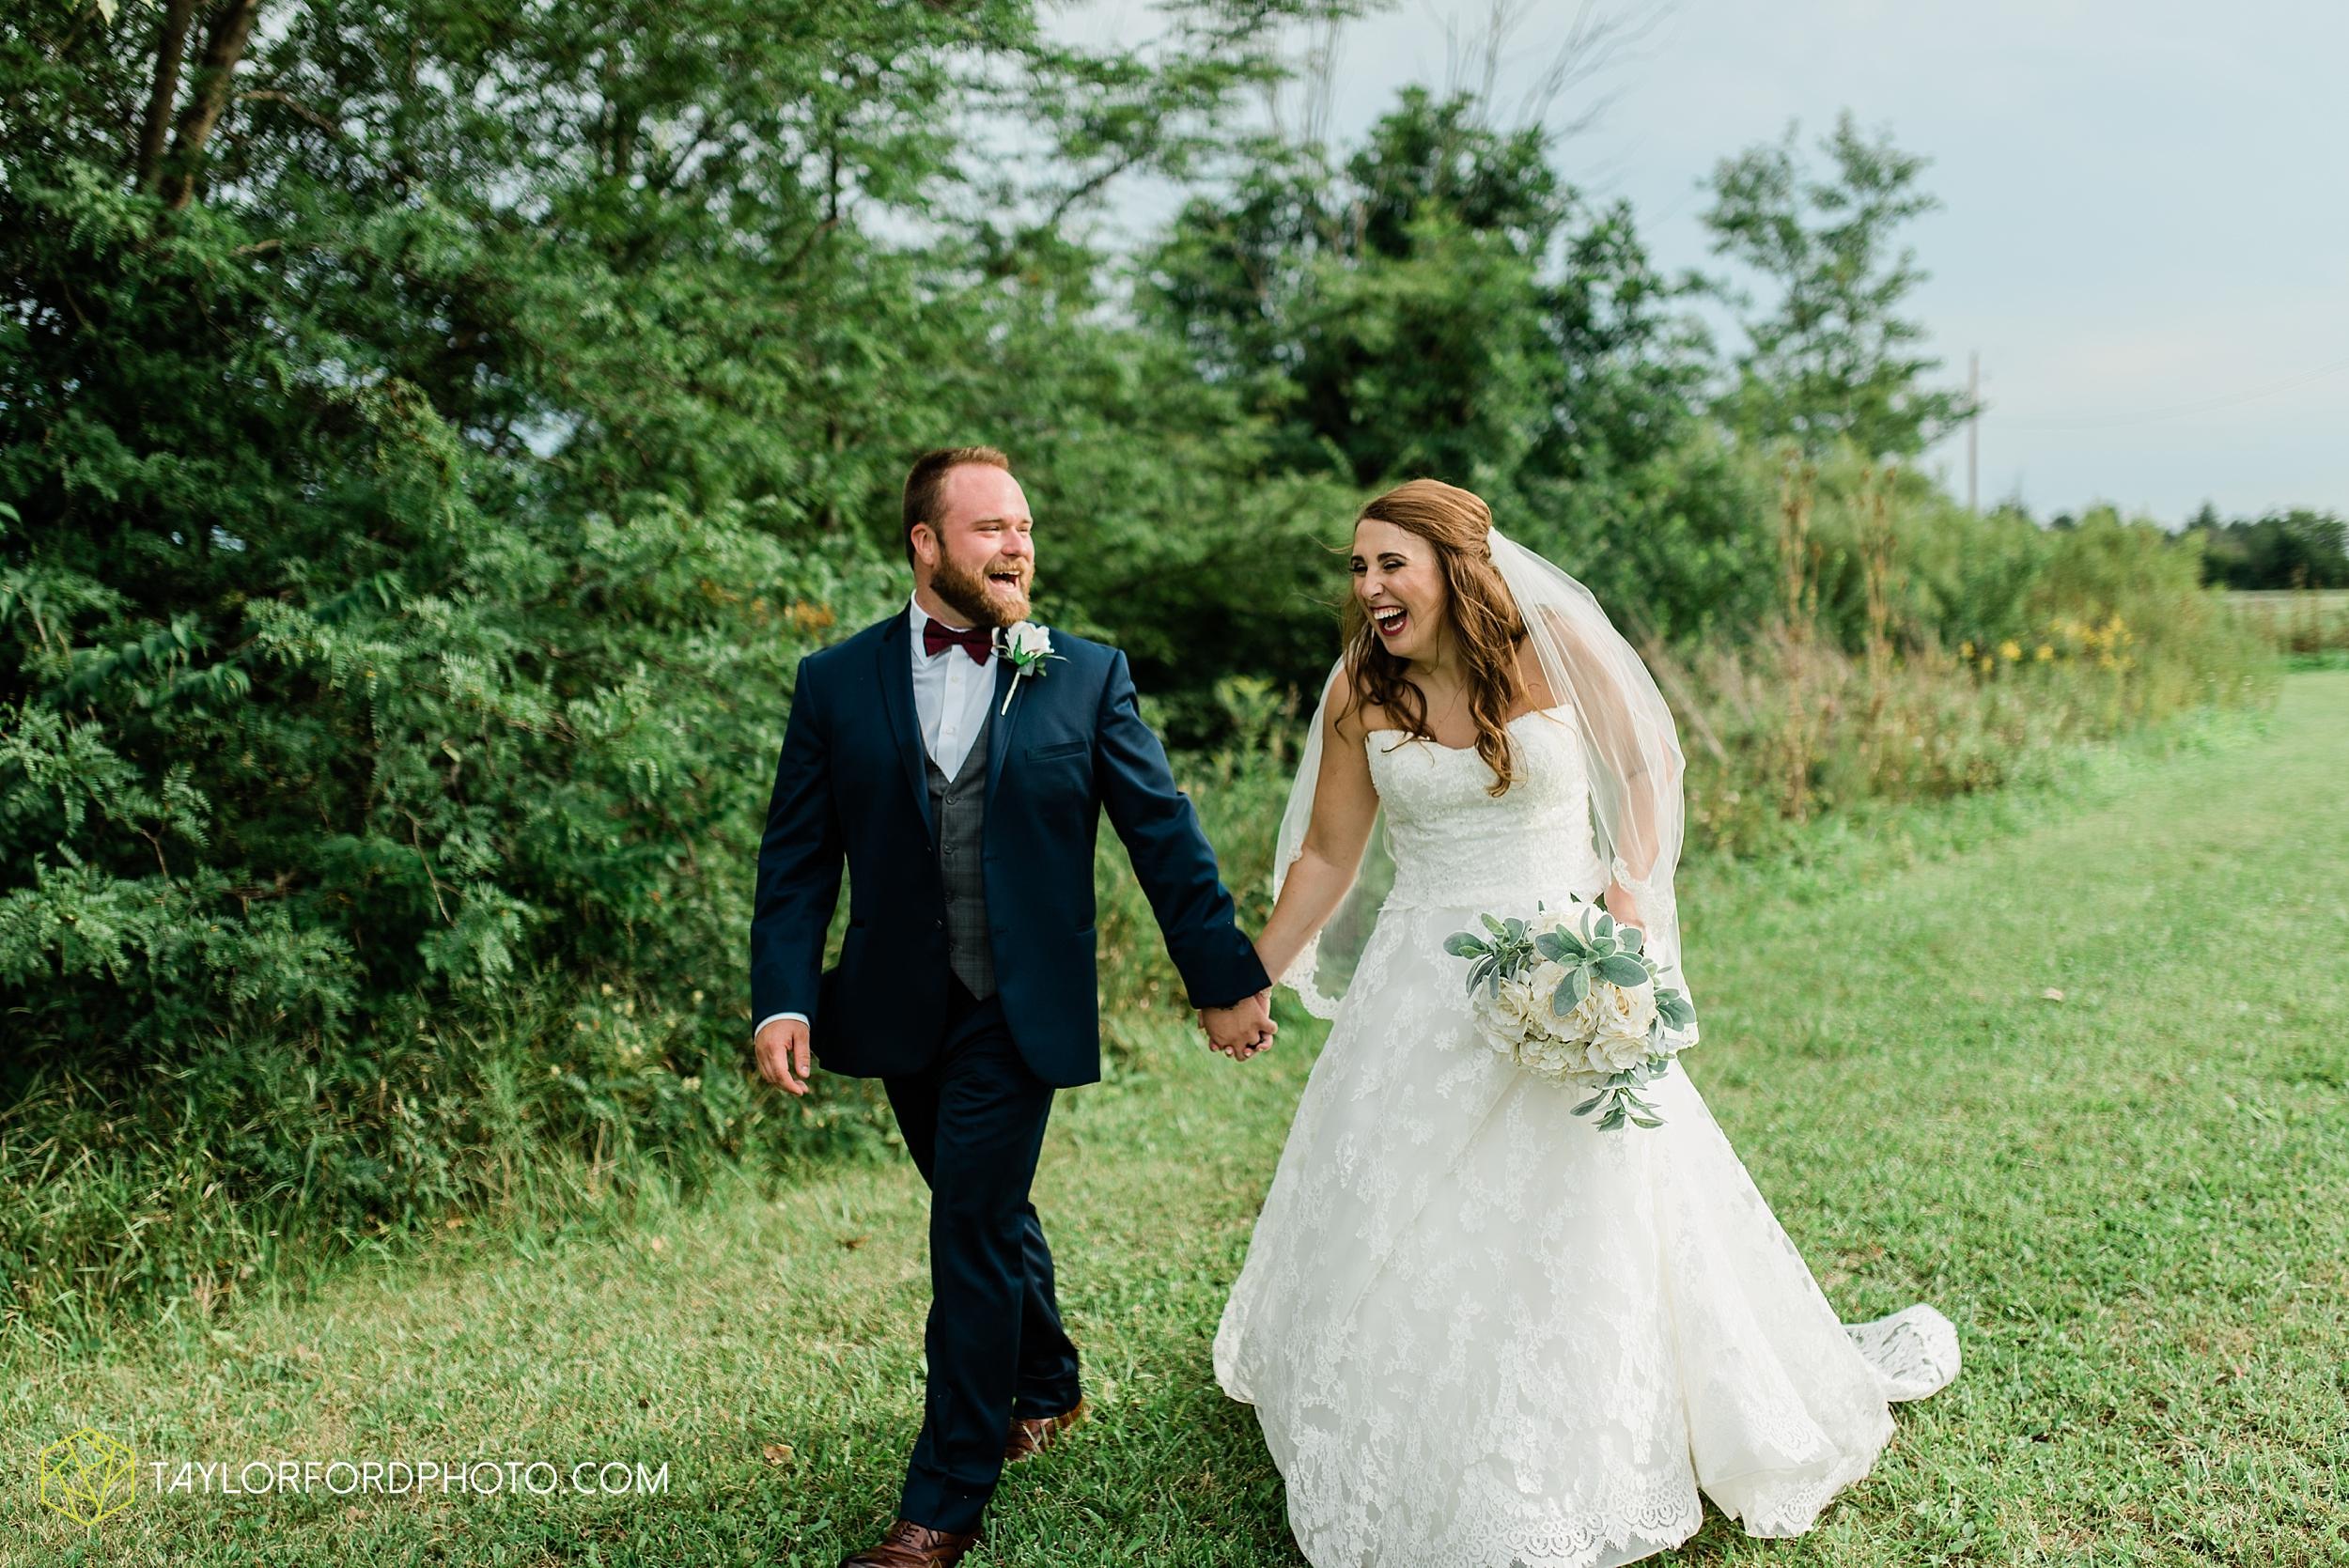 chelsey-zosh-jackson-young-first-united-methodist-church-senior-center-van-wert-ohio-wedding-photographer-taylor-ford-photography_0080.jpg